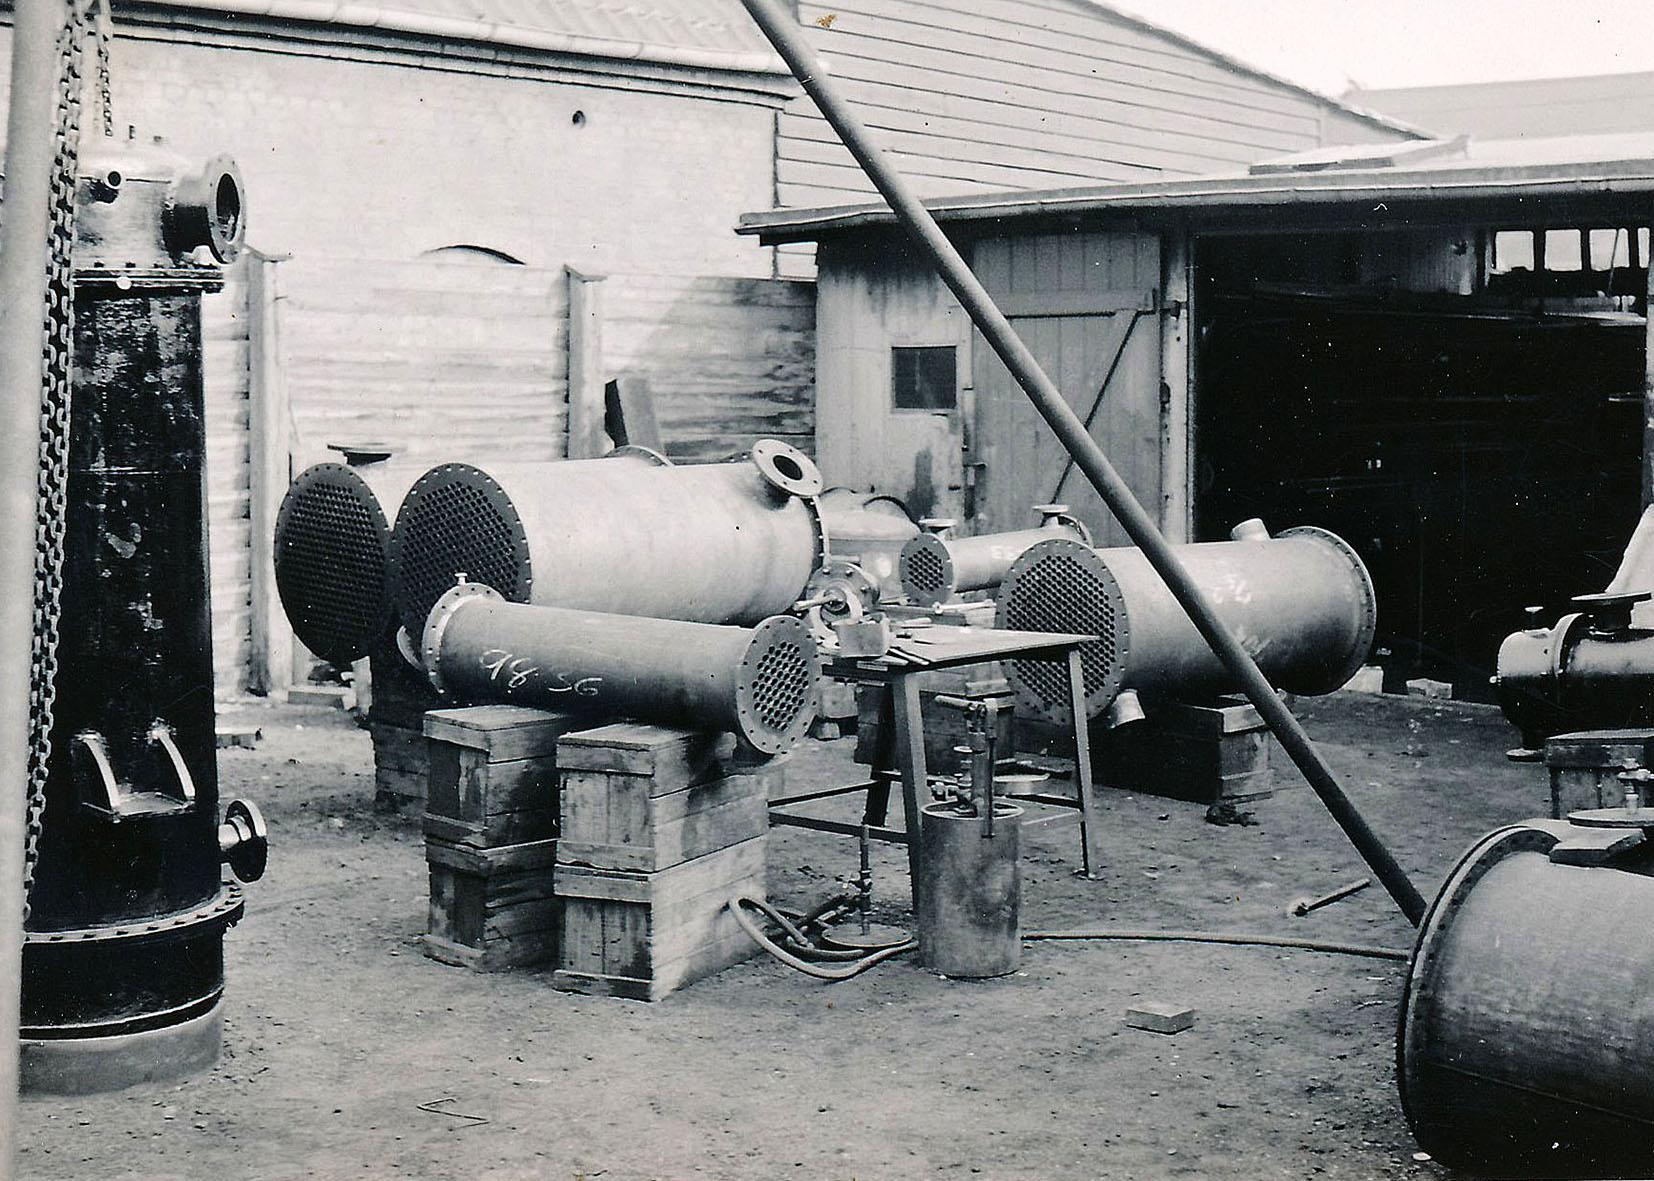 reci-beholdere-udenfor-ca.-1935